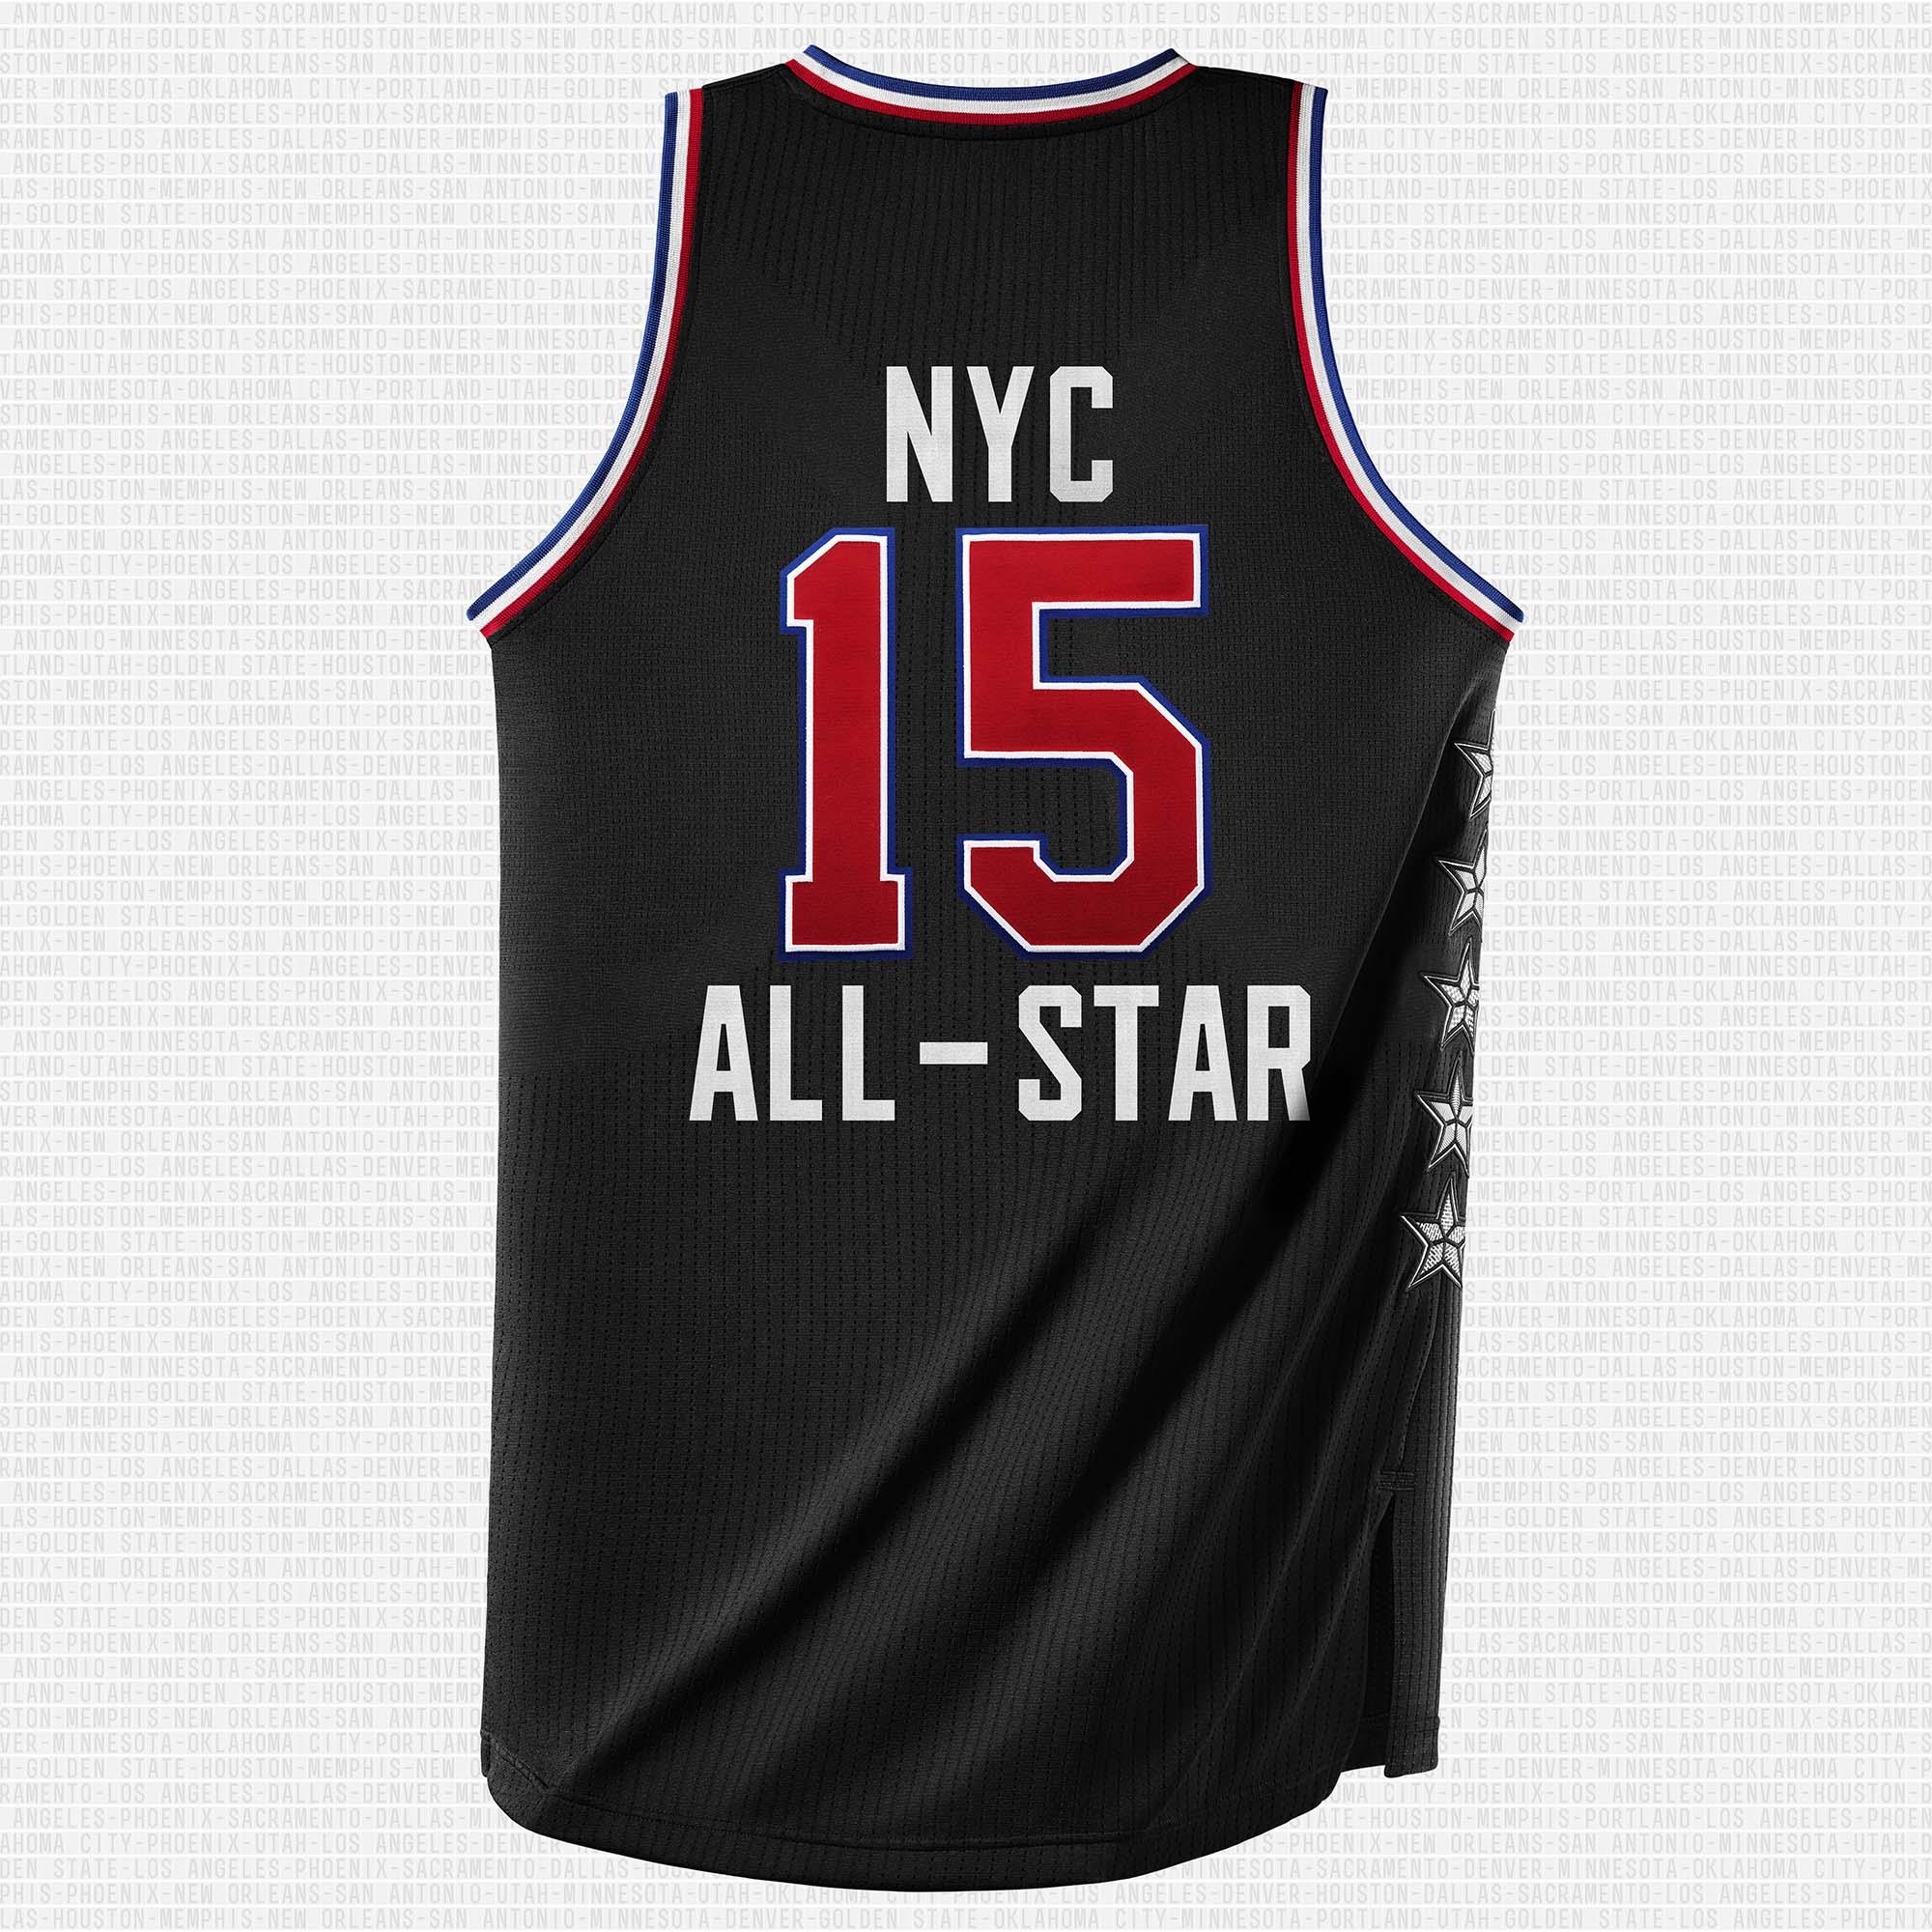 adidas-NBA-All-Star-2015-West-Jersey-Side-Sq-1.jpg